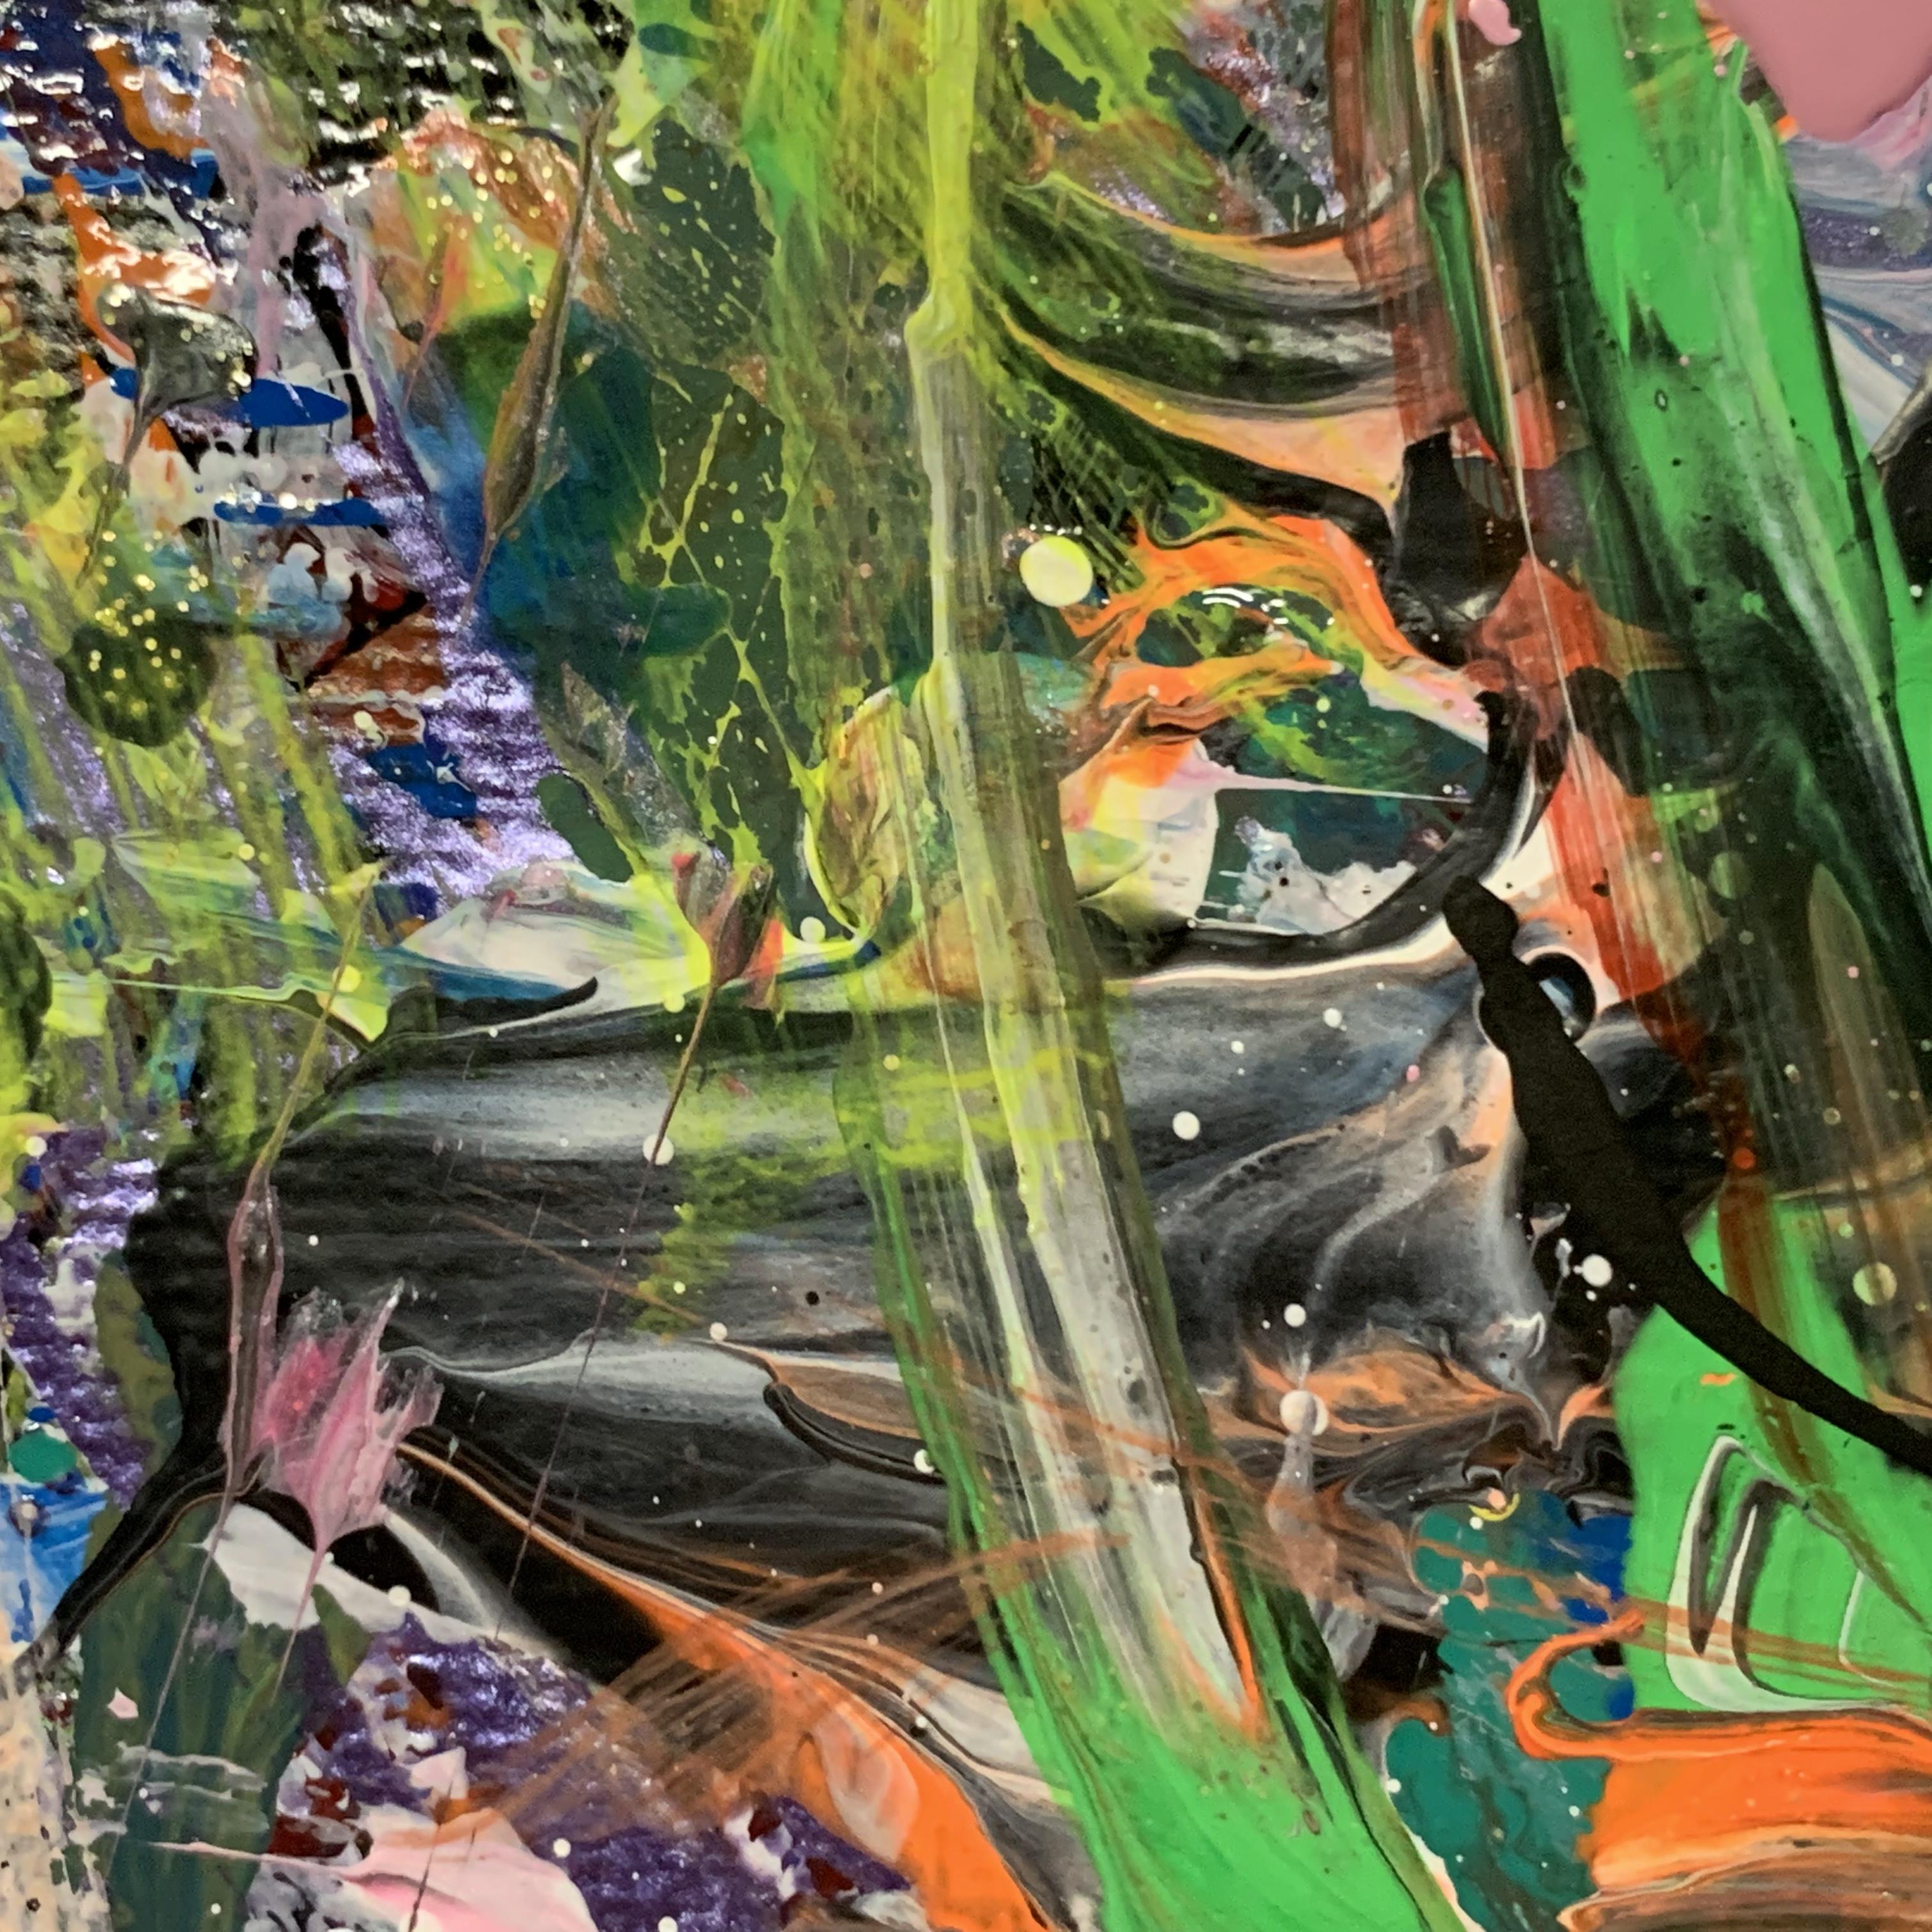 Telasuna by Francisco Gutiérrez | ArtworkNetwork.com